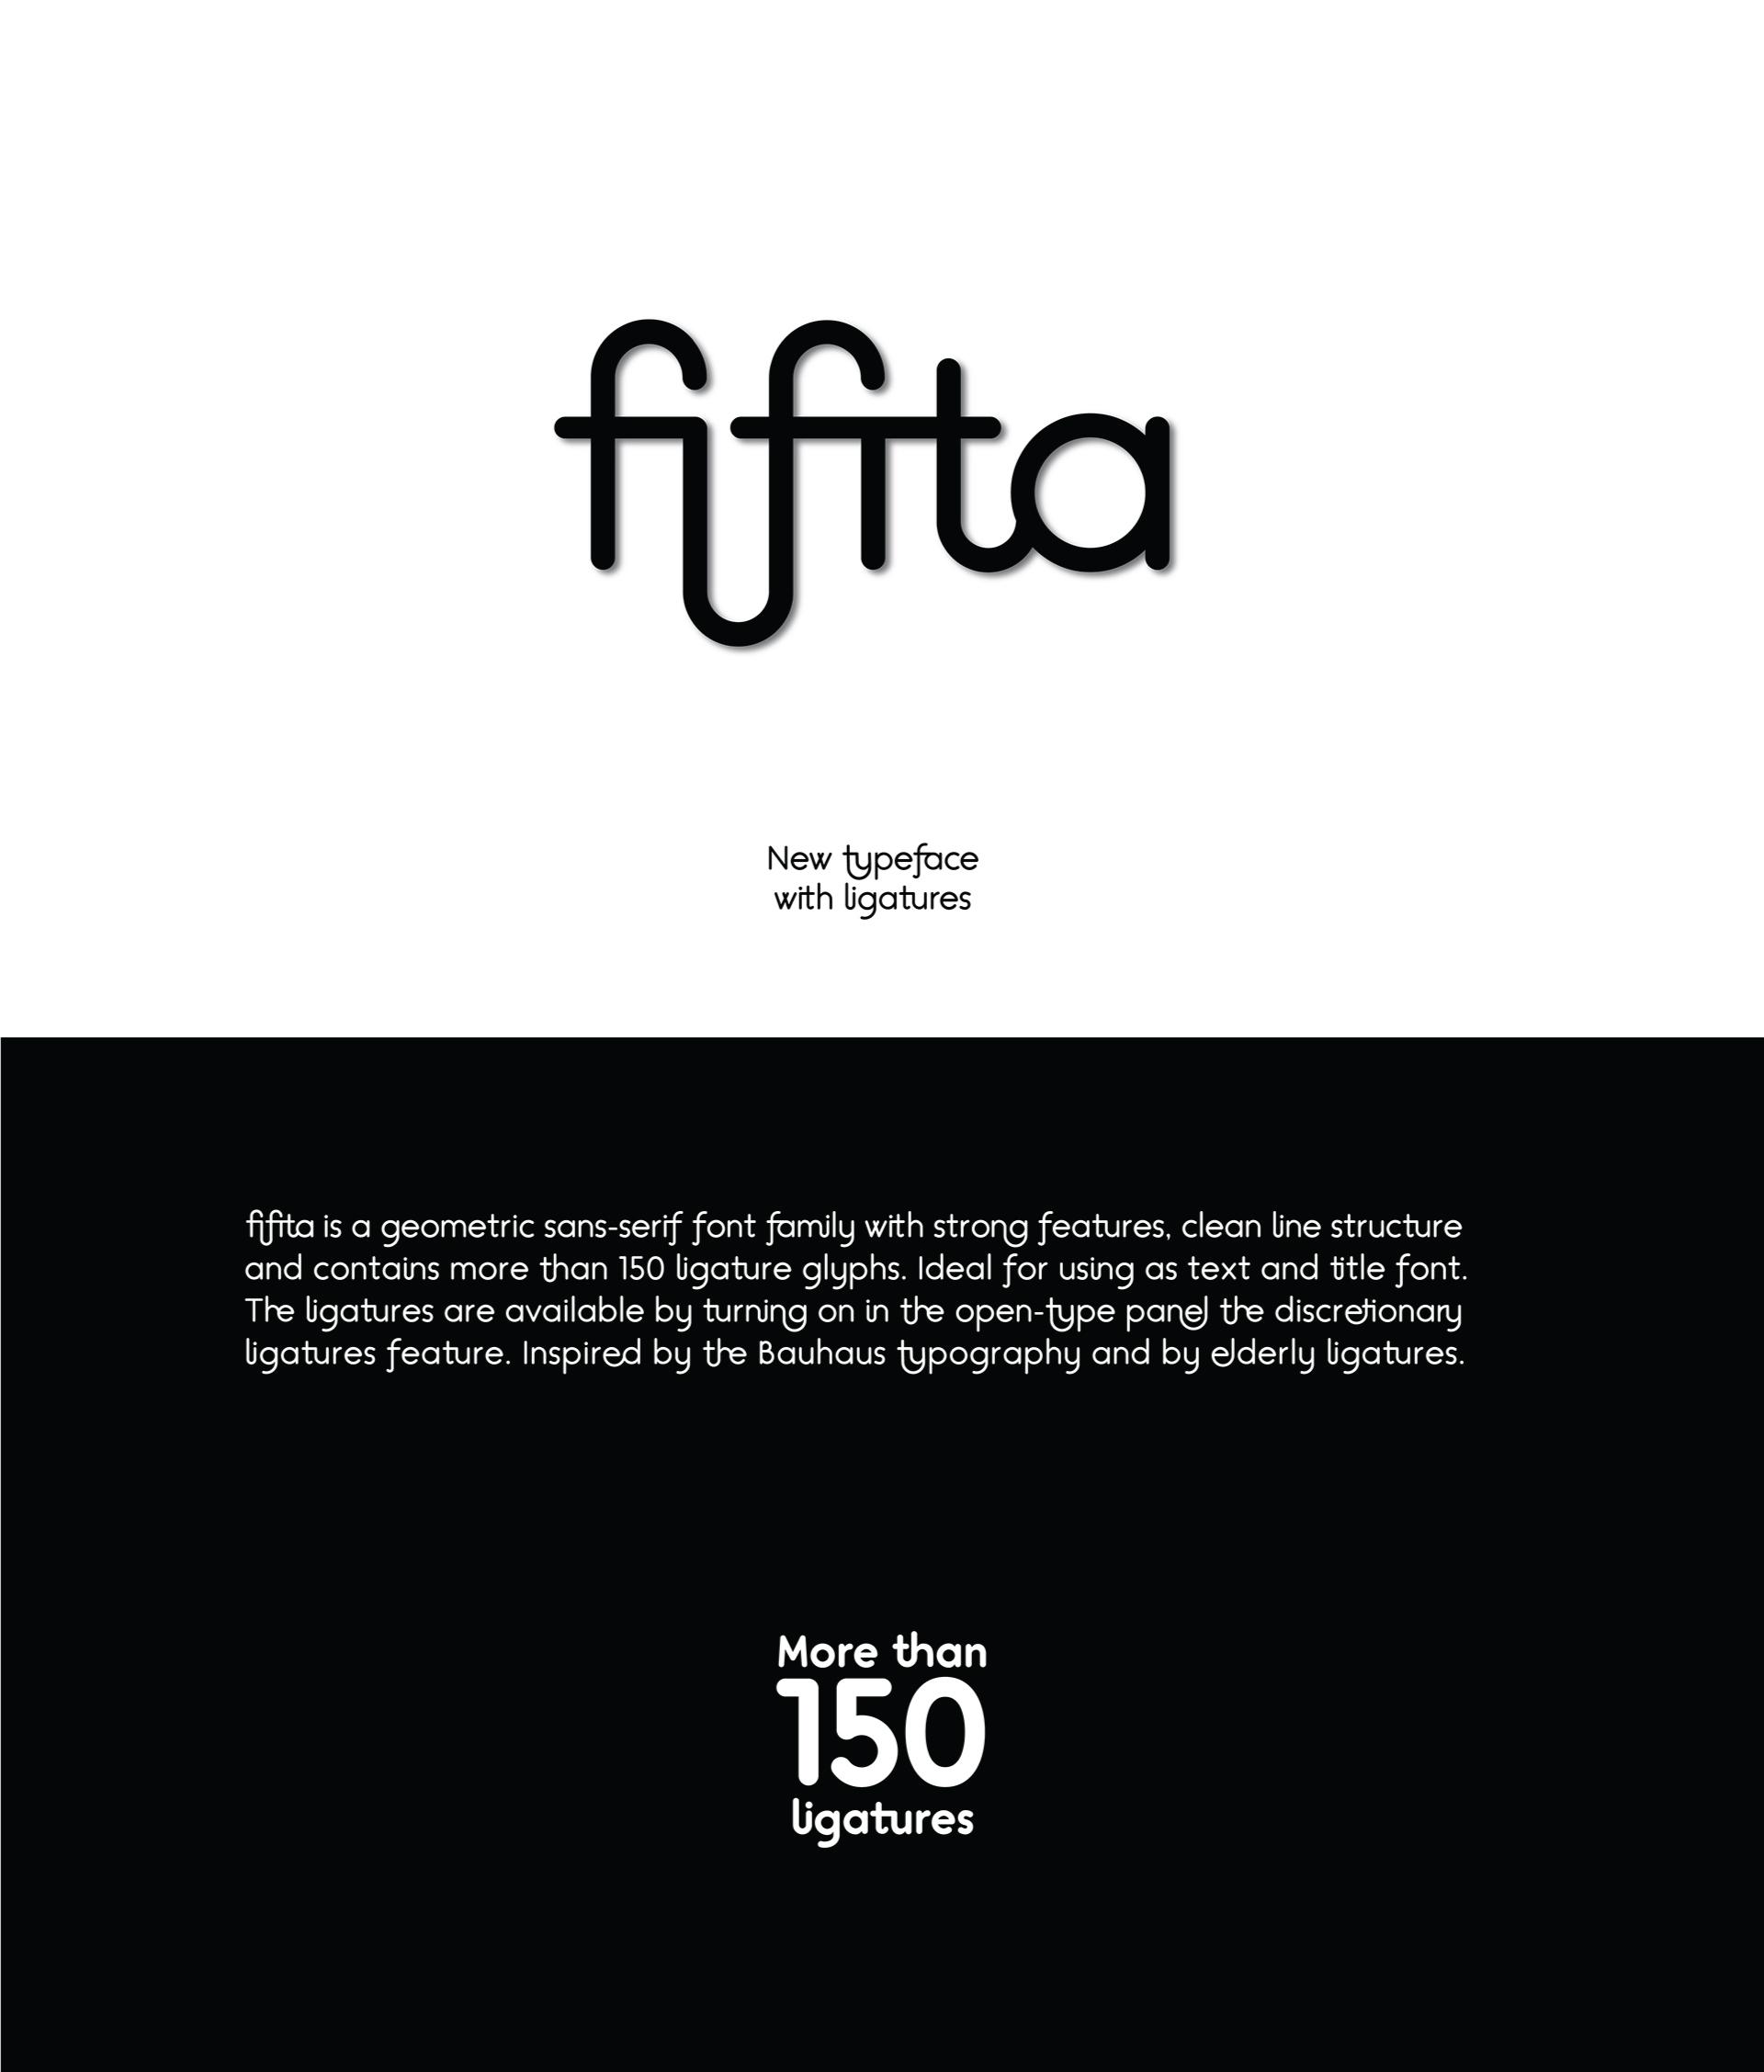 Fifita-Main-1.jpg